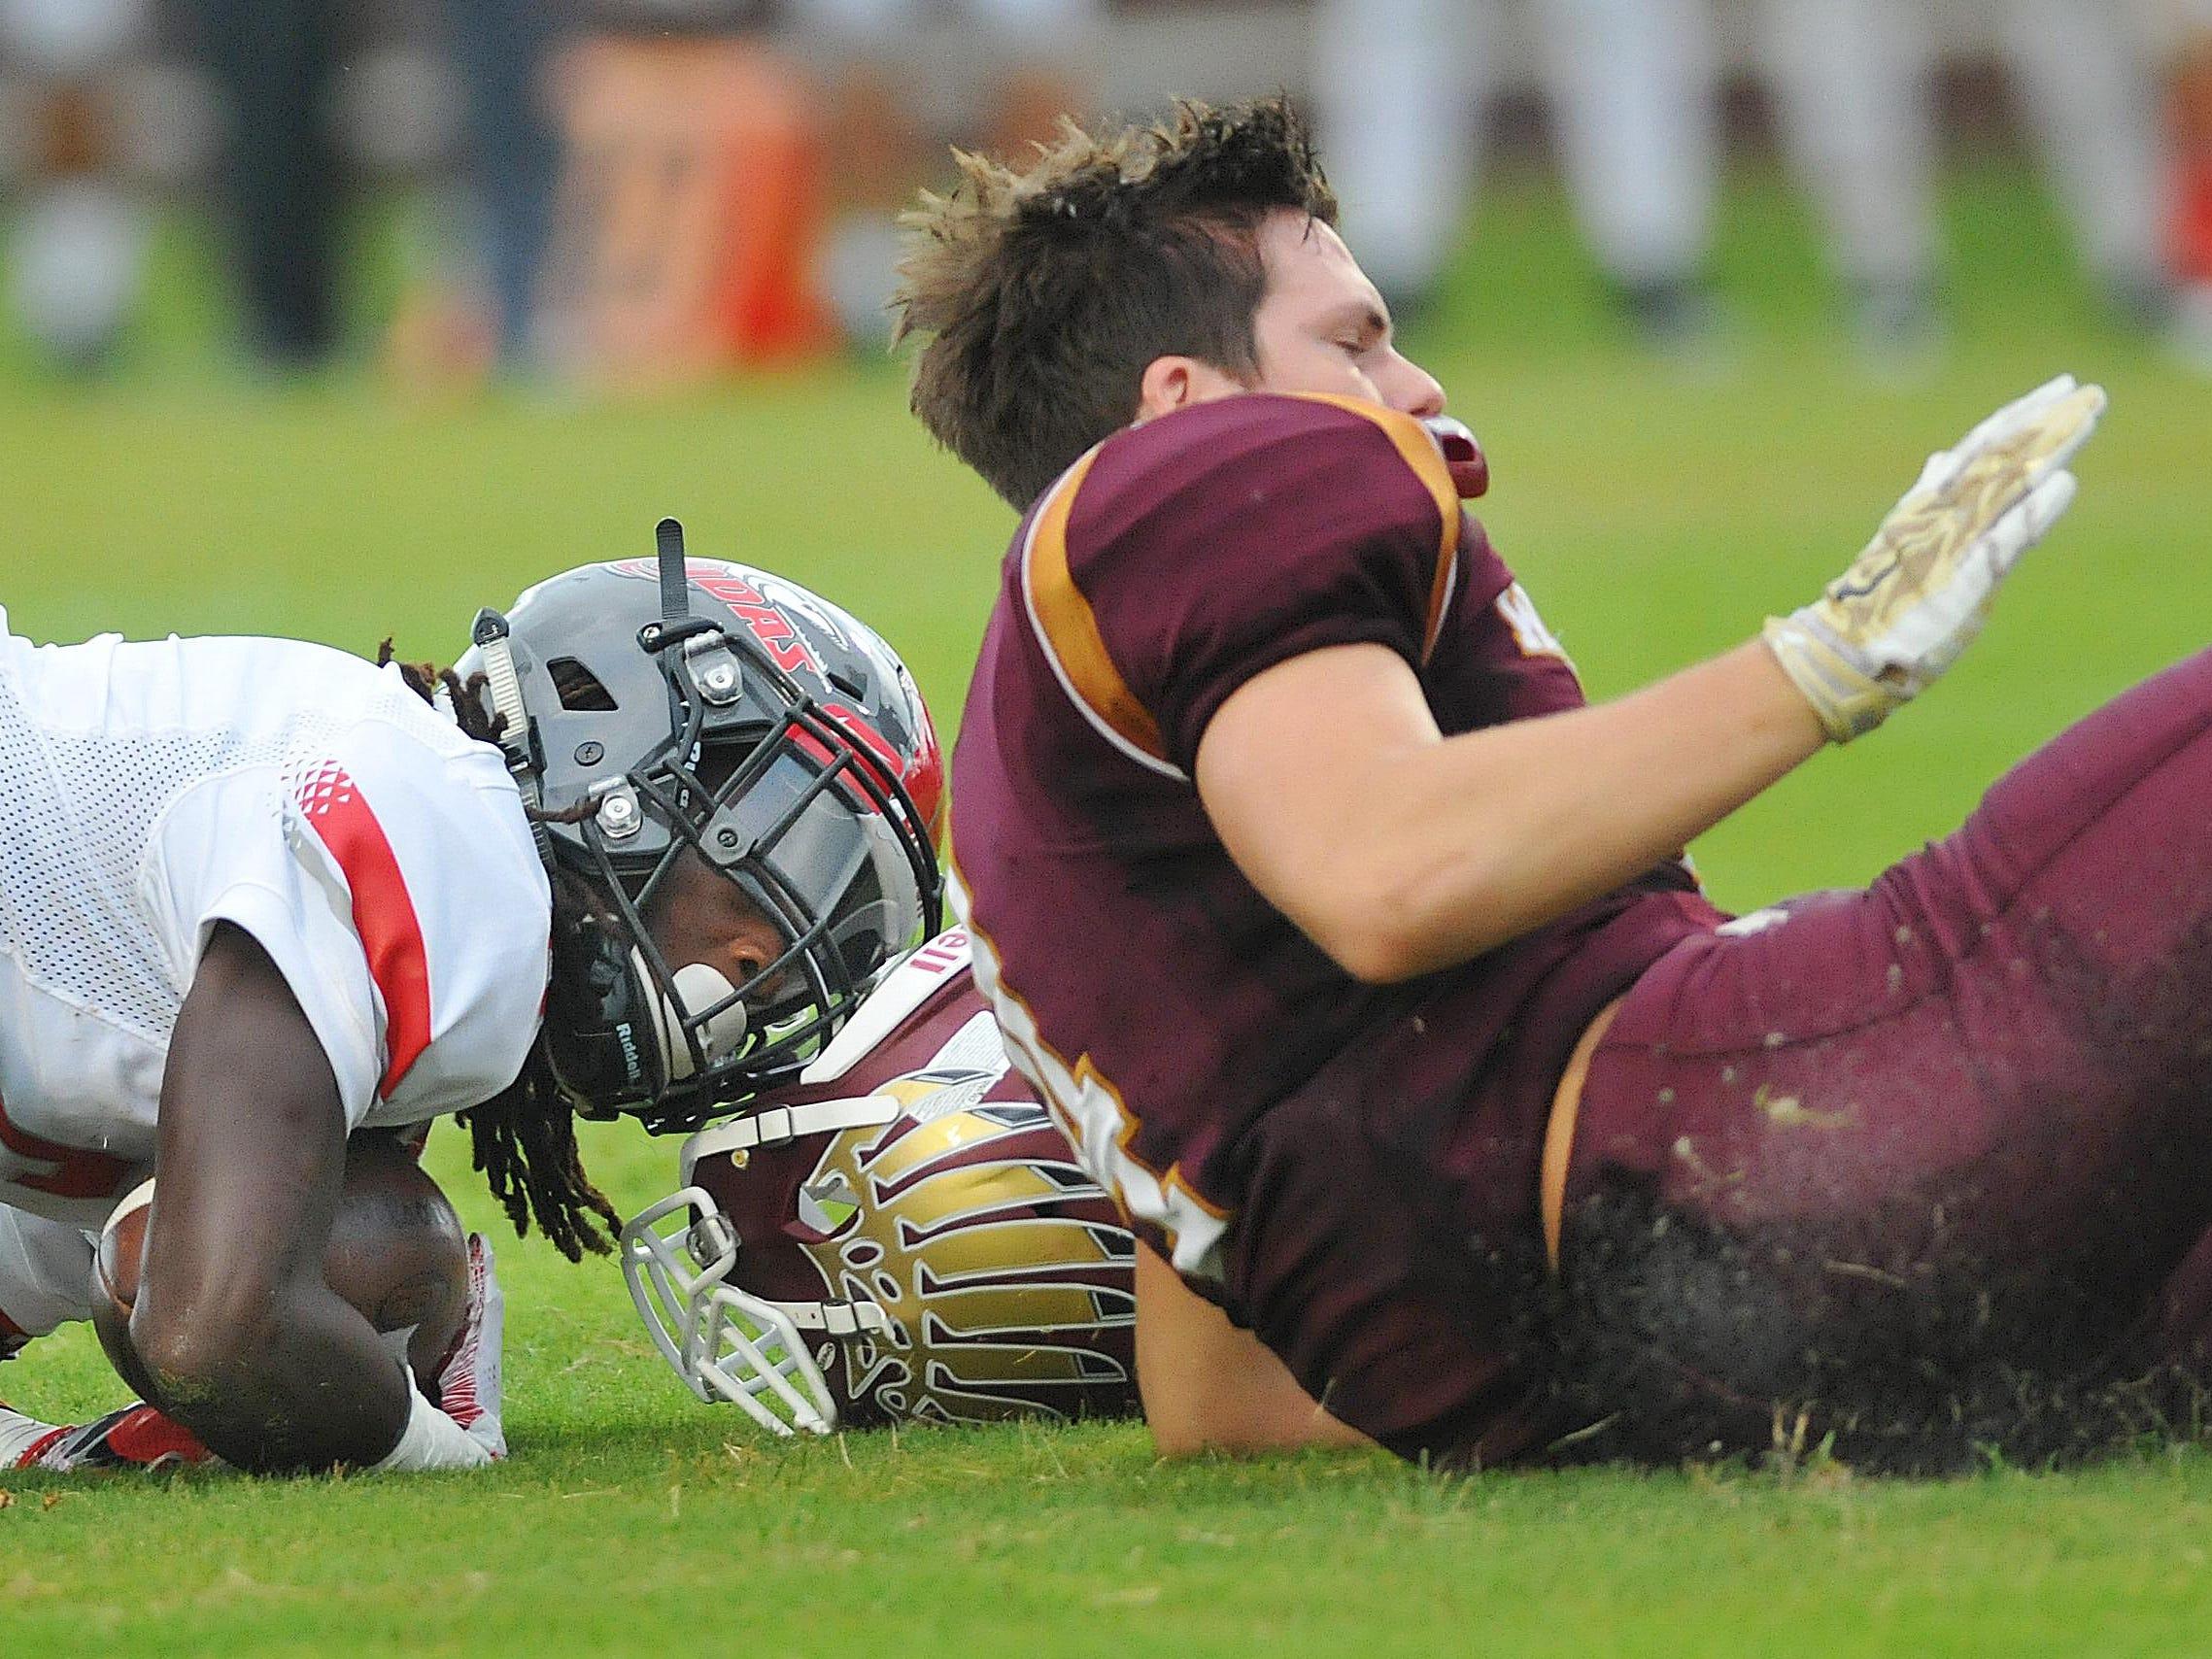 Astronaut high's #4 Cameron Ockerman loses his helmet as he hammers New Smyrna Highs #22 Einaj Carter during Friday nights game held at Storey -Taylor Stadium Astronaut High School.